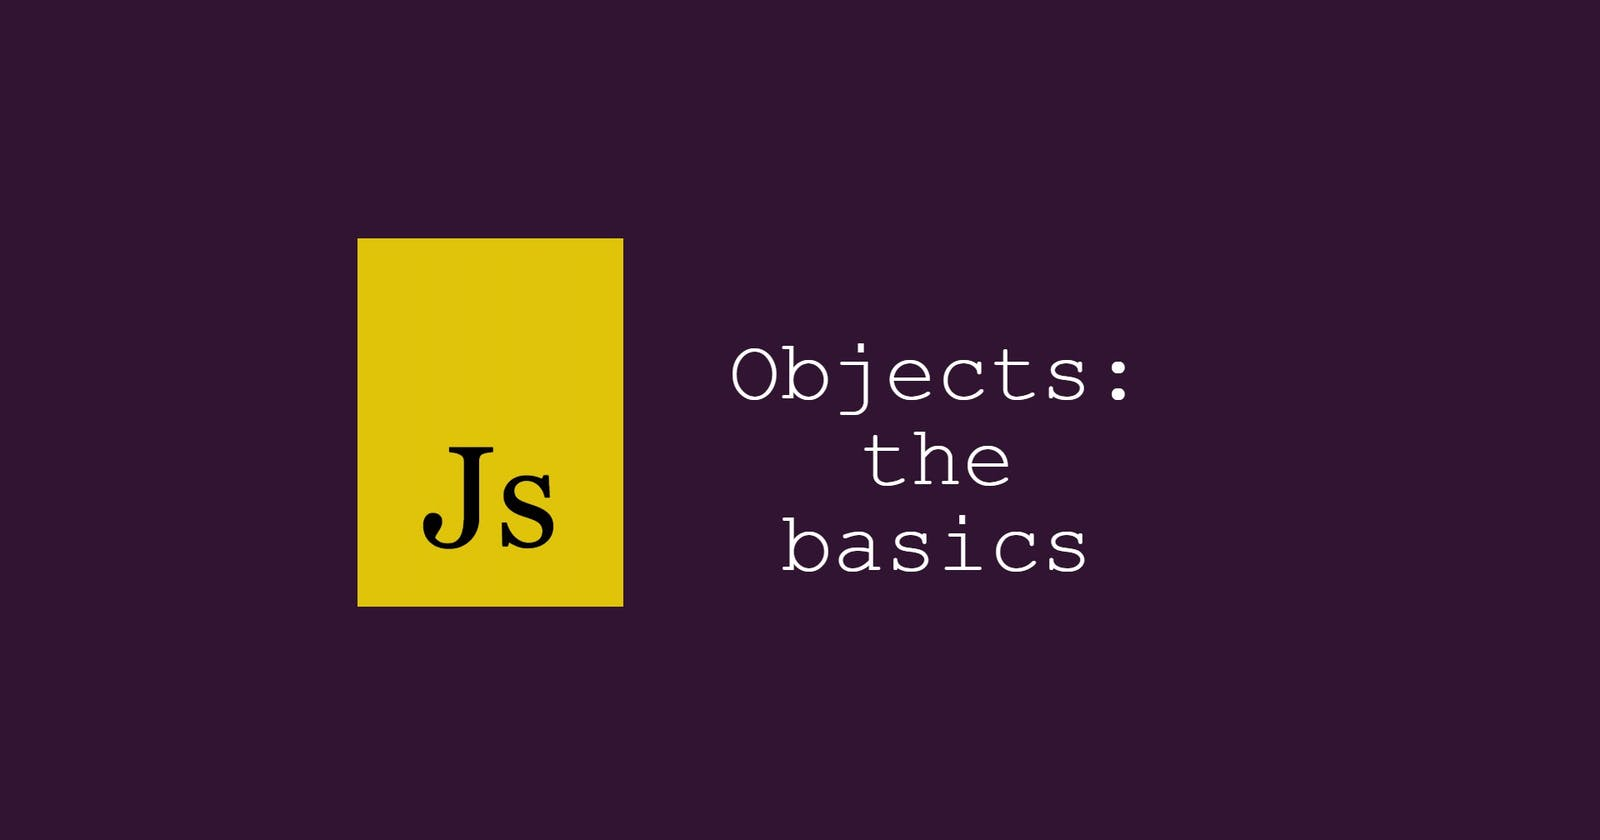 Objects: the basics